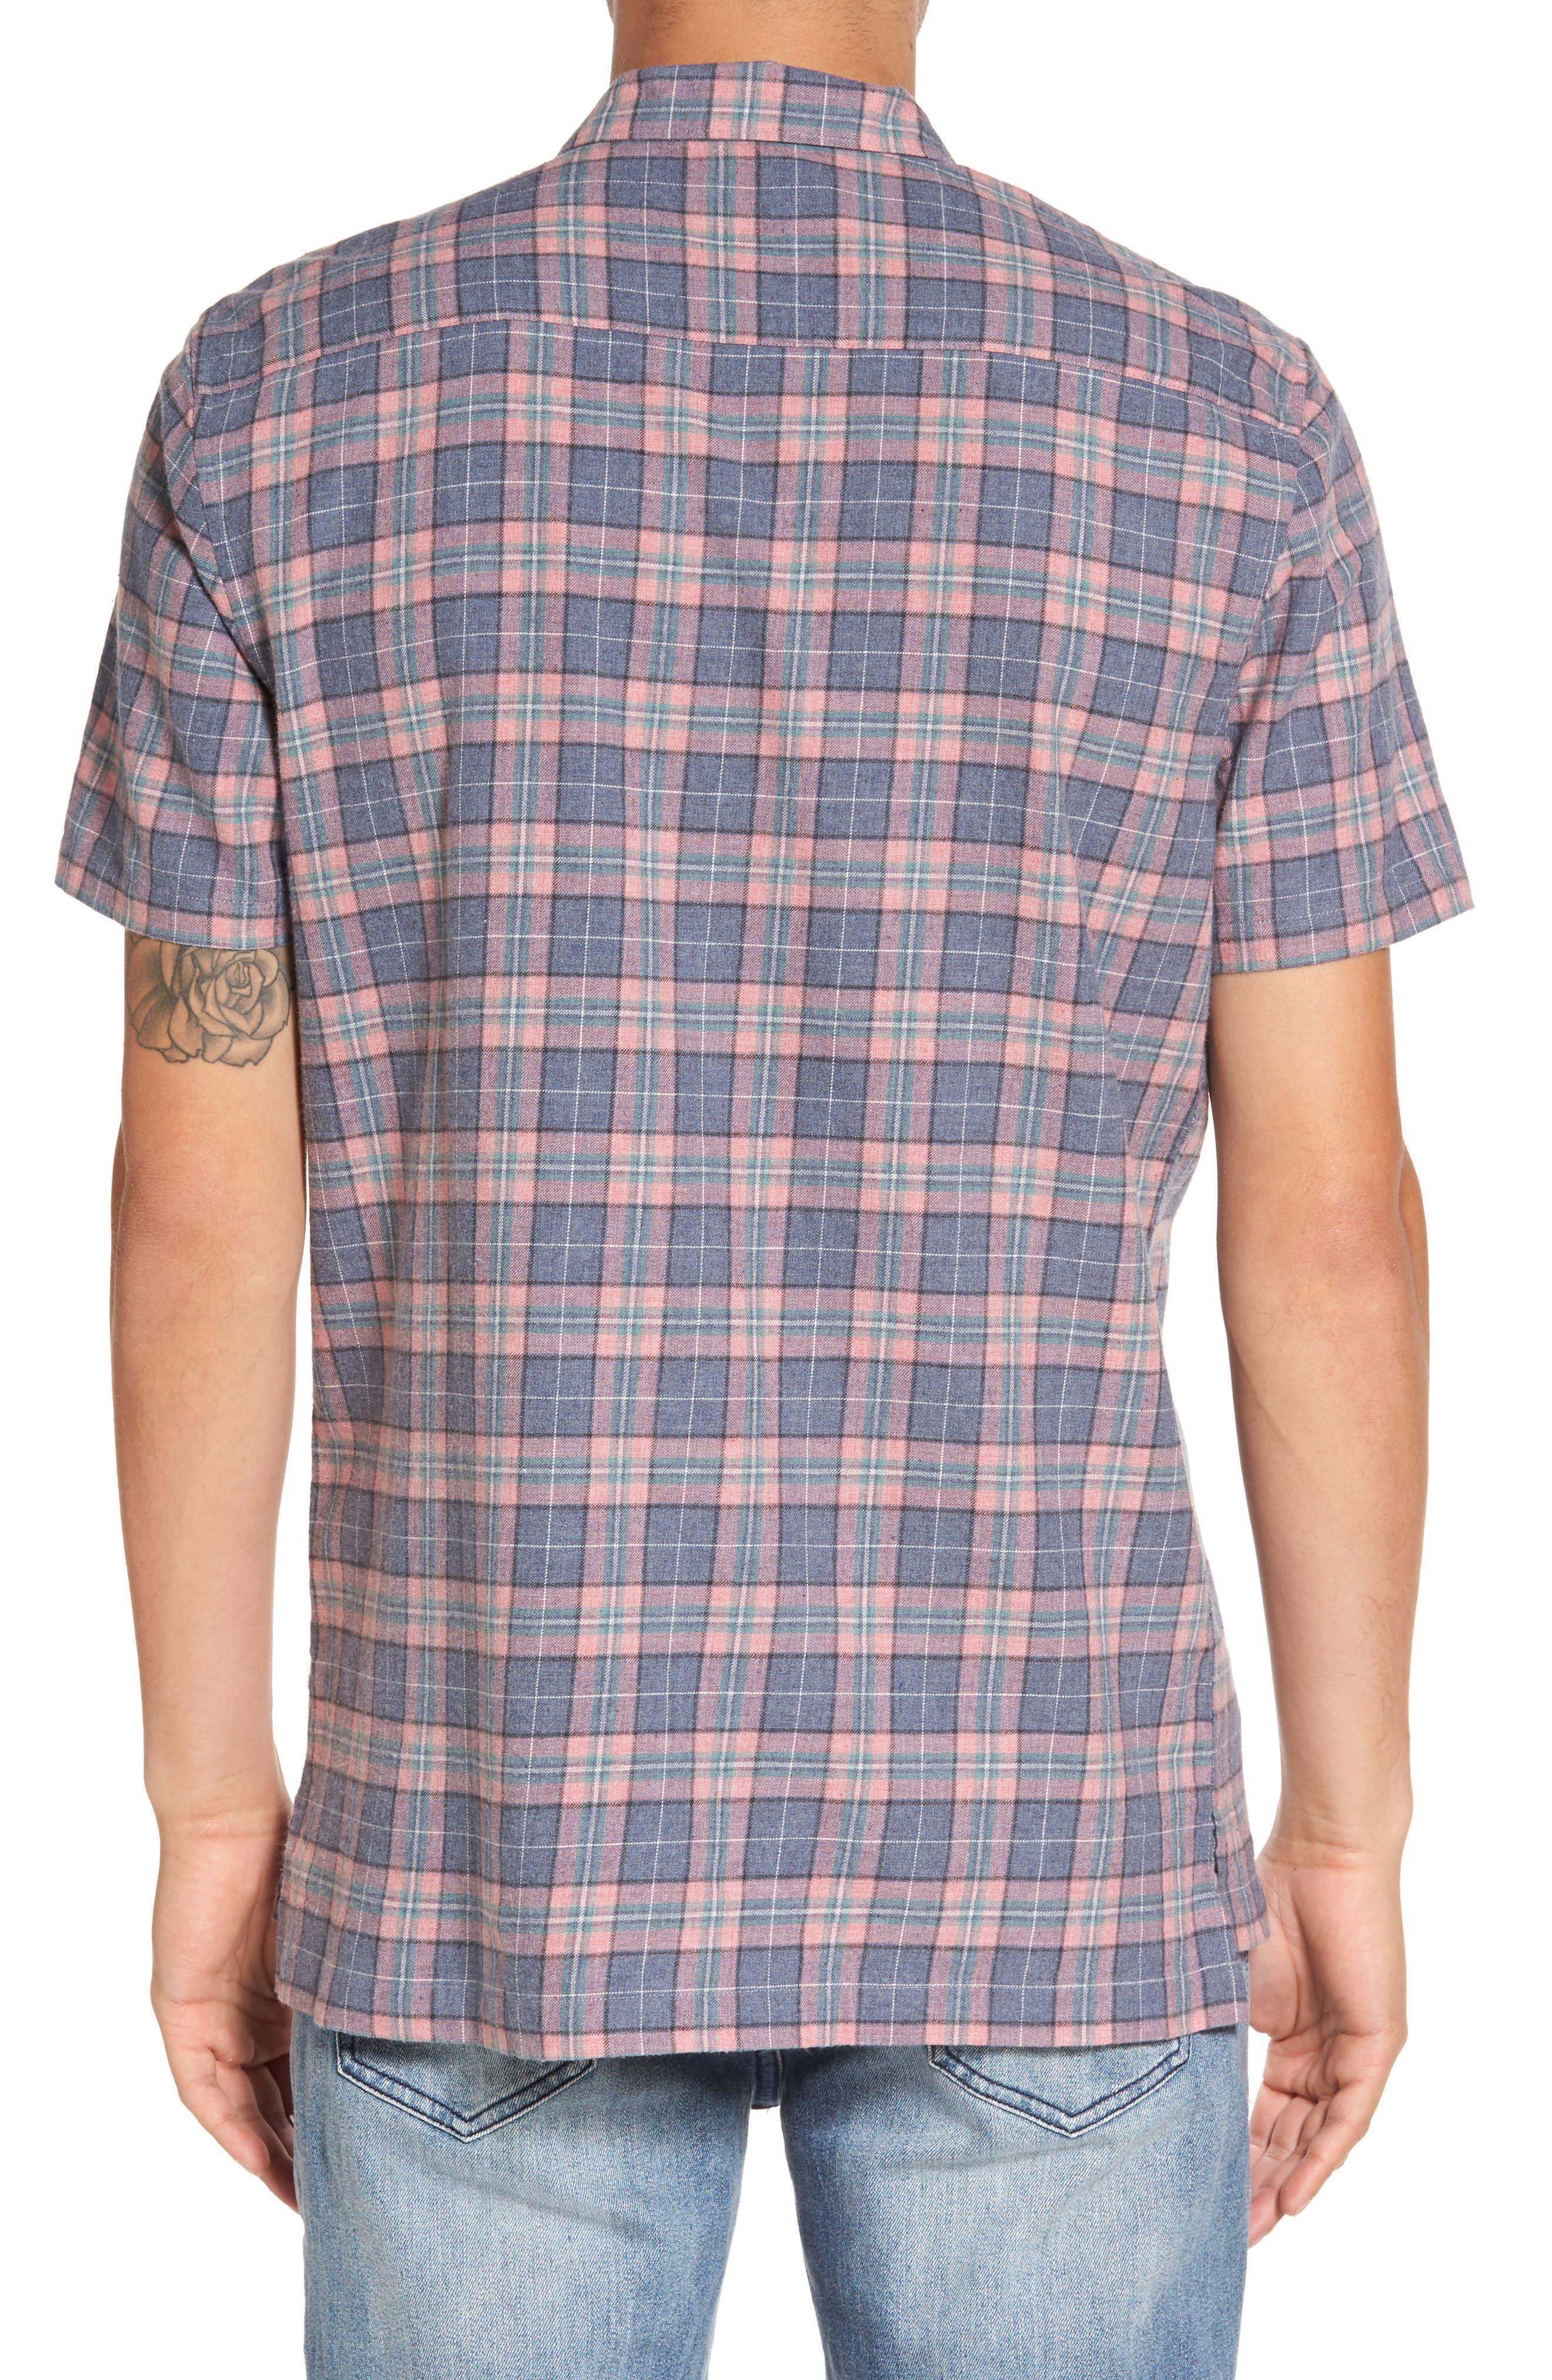 Alternate Image 2  - Barney Cools Florida Short Sleeve Plaid Shirt